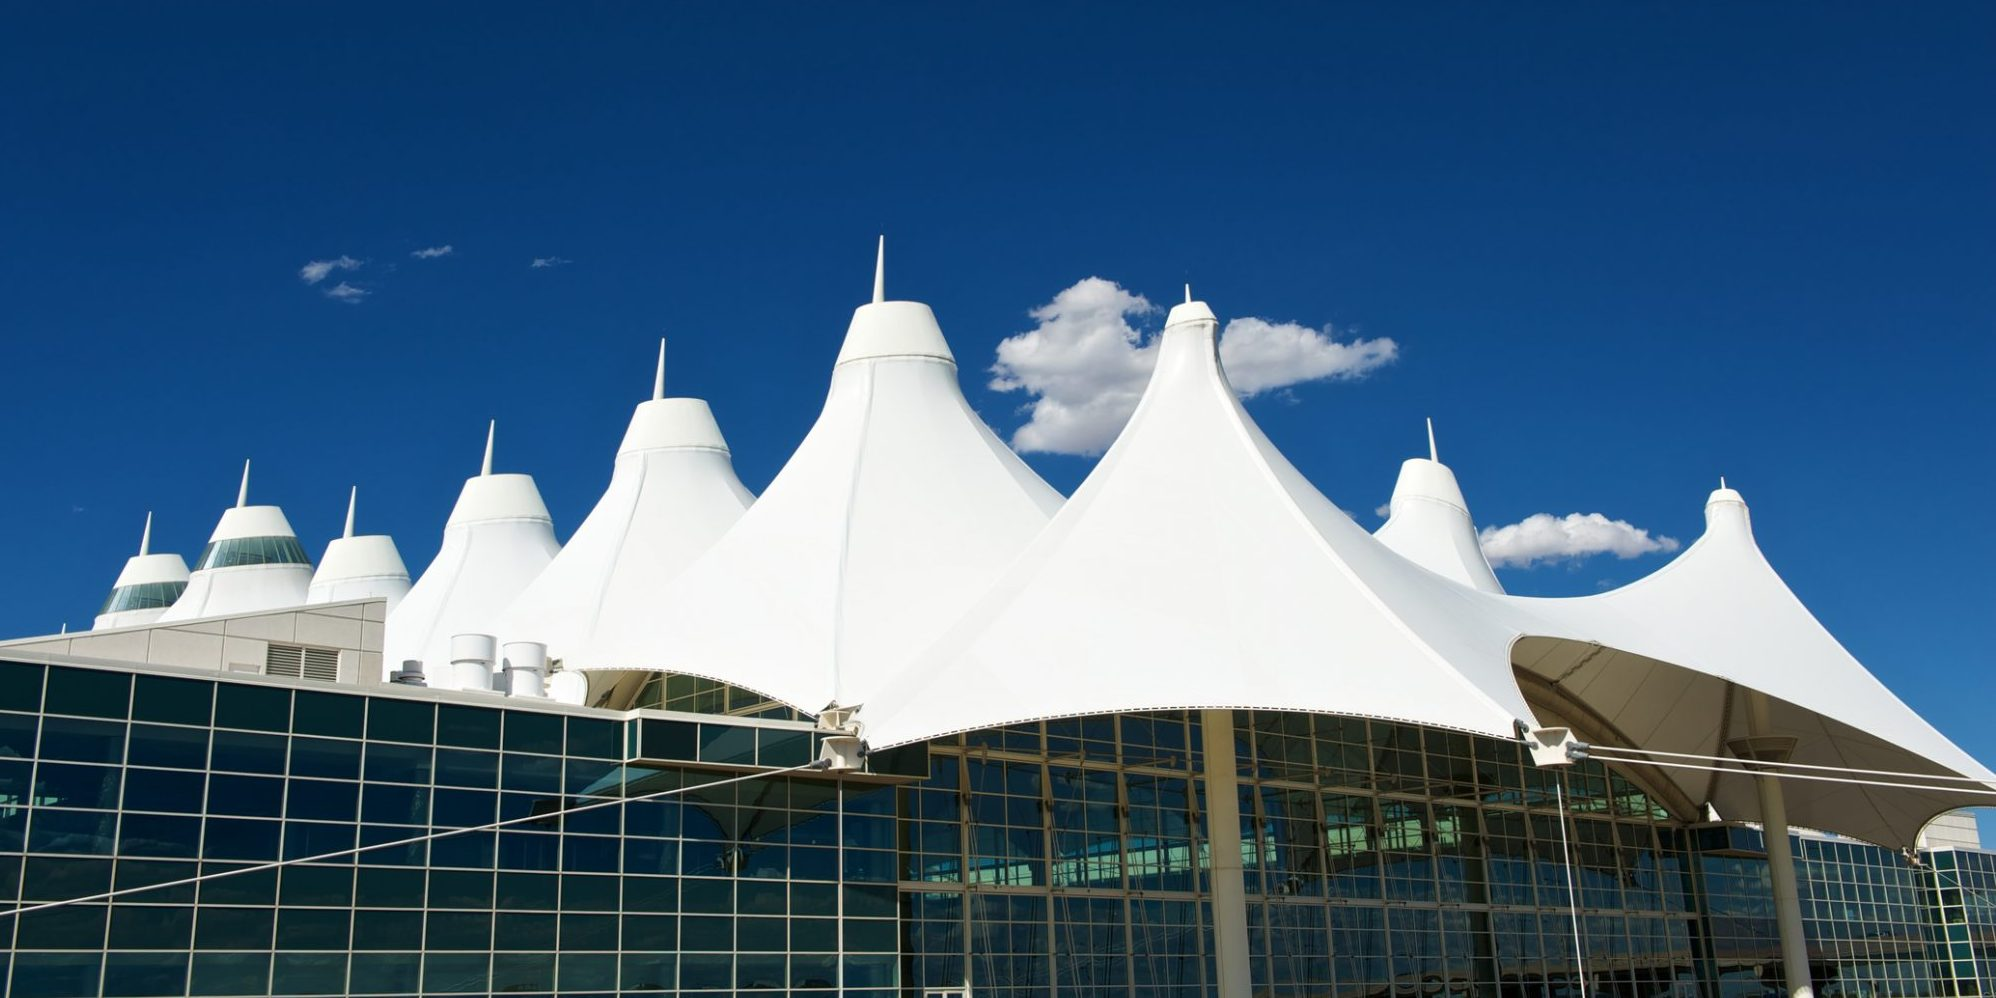 image of denver international airport